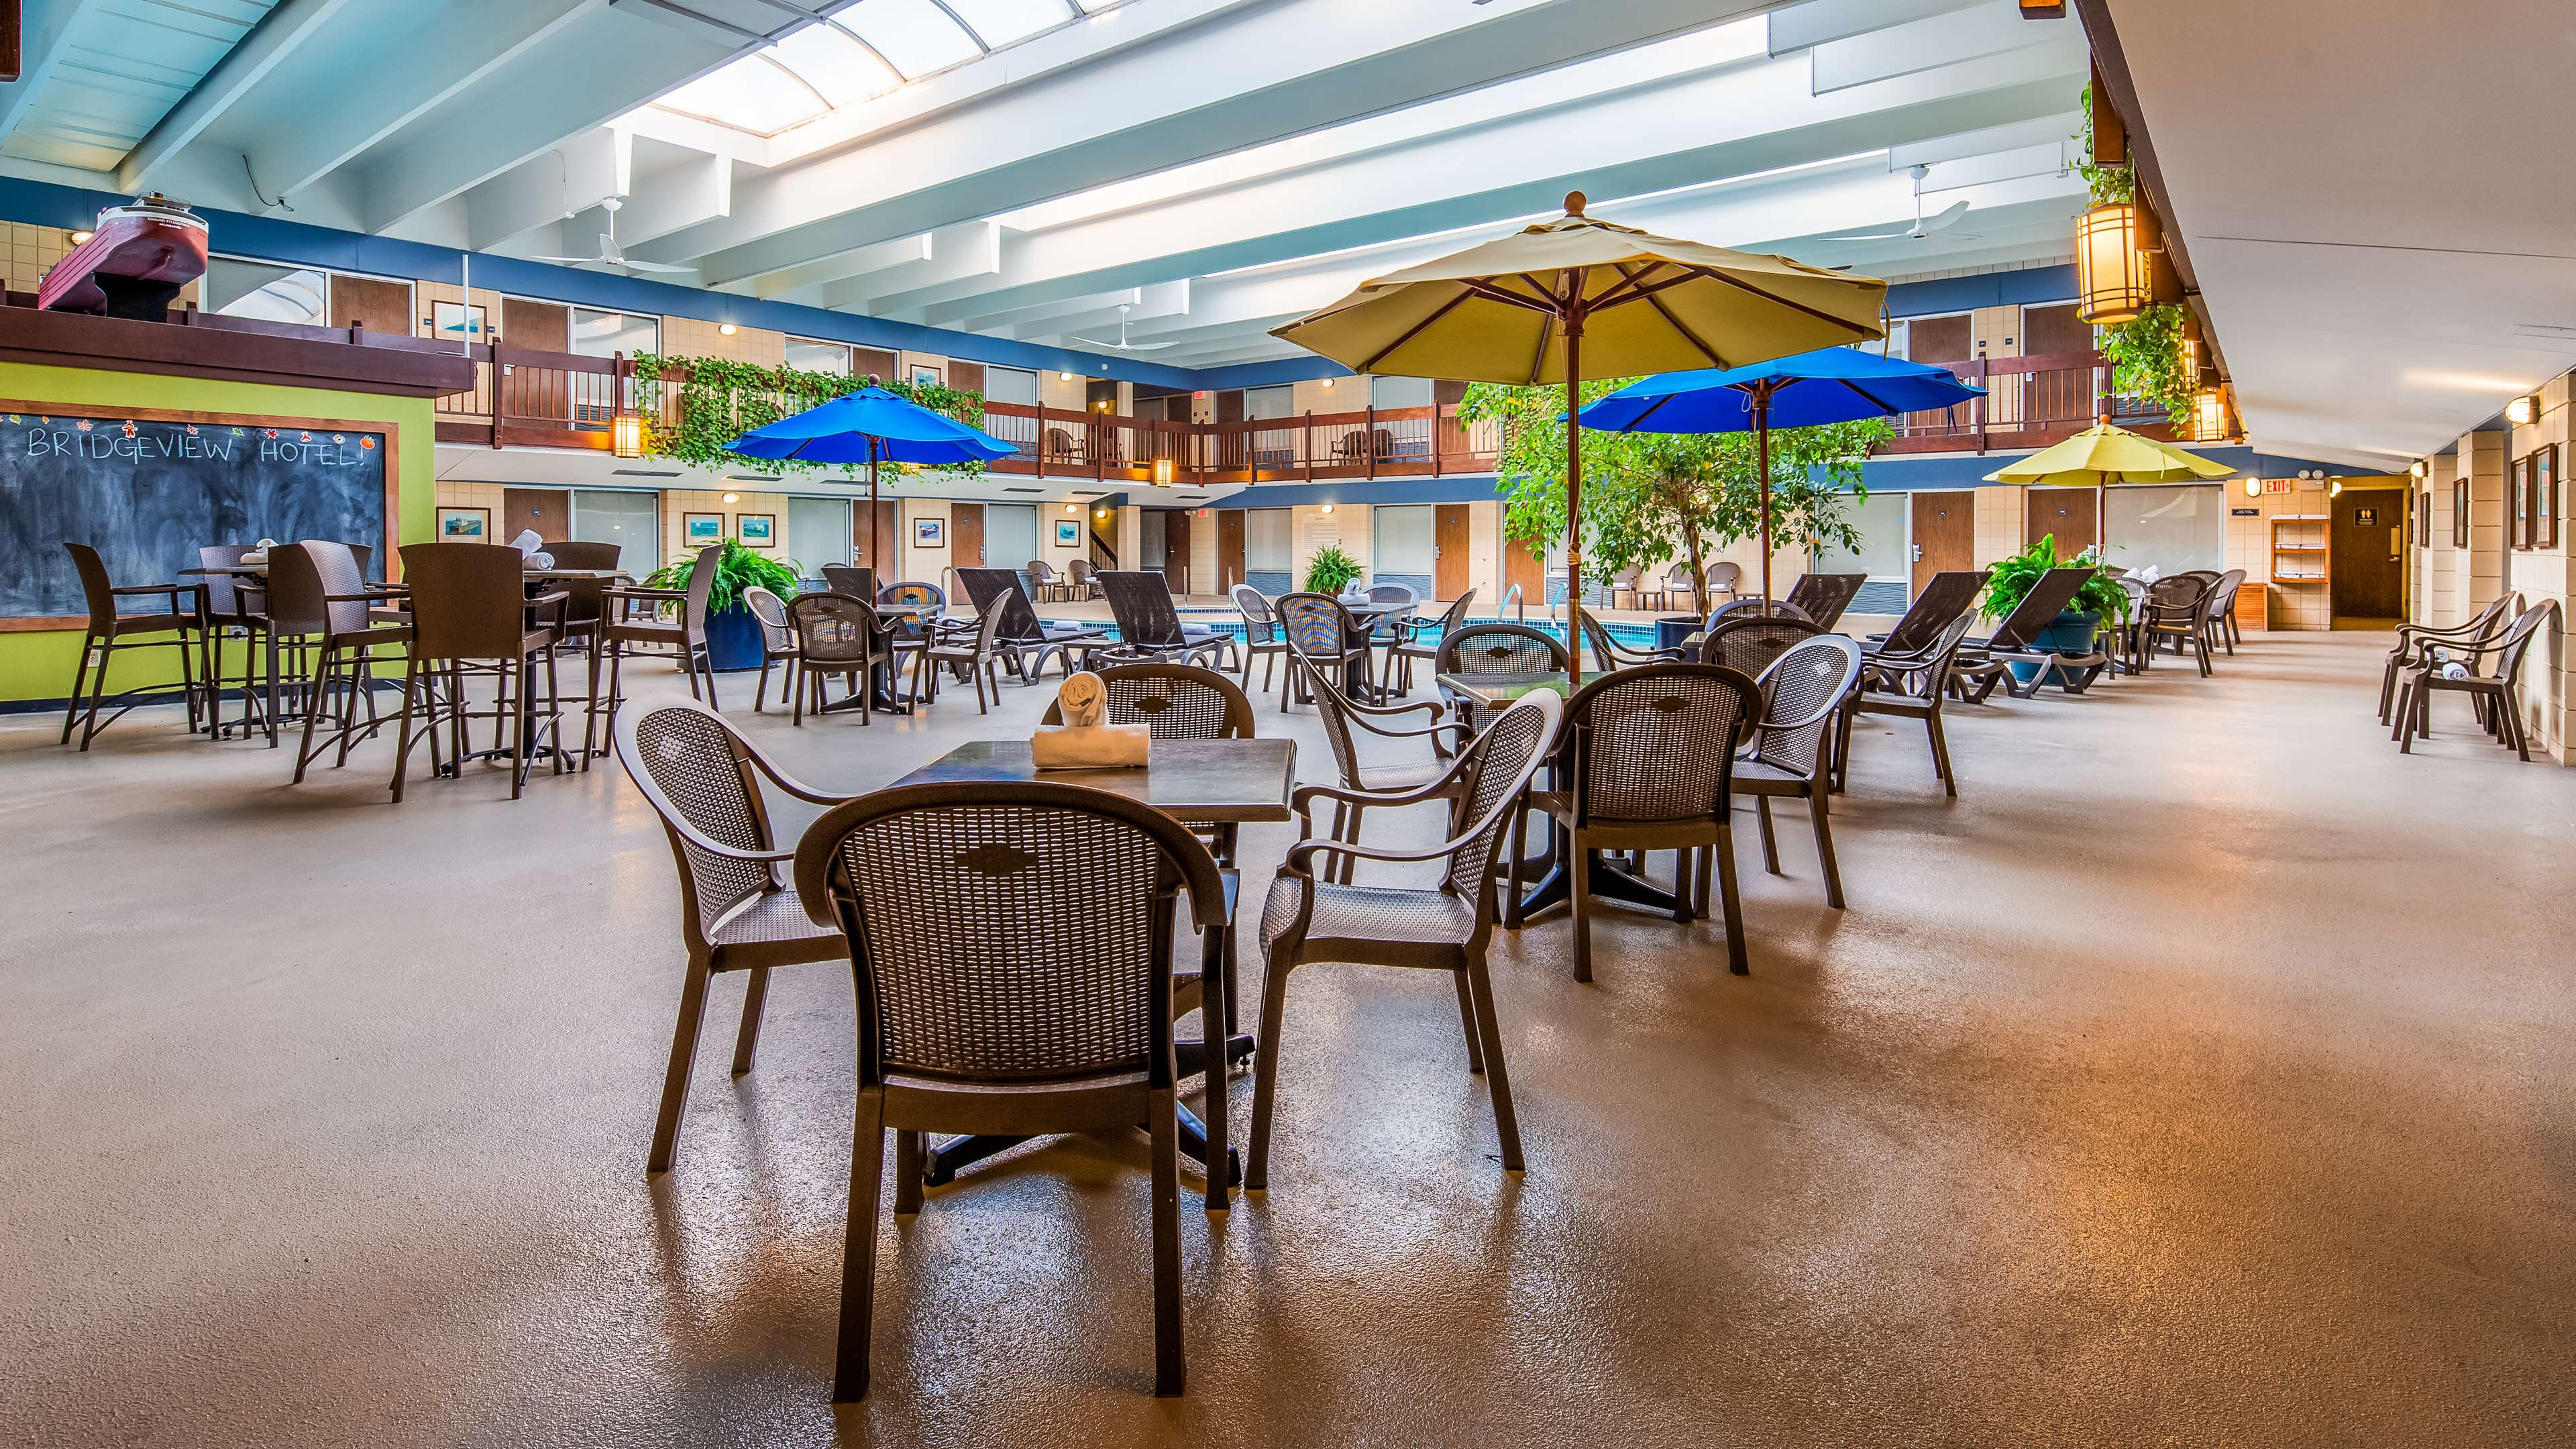 Best Western Bridgeview Hotel image 12